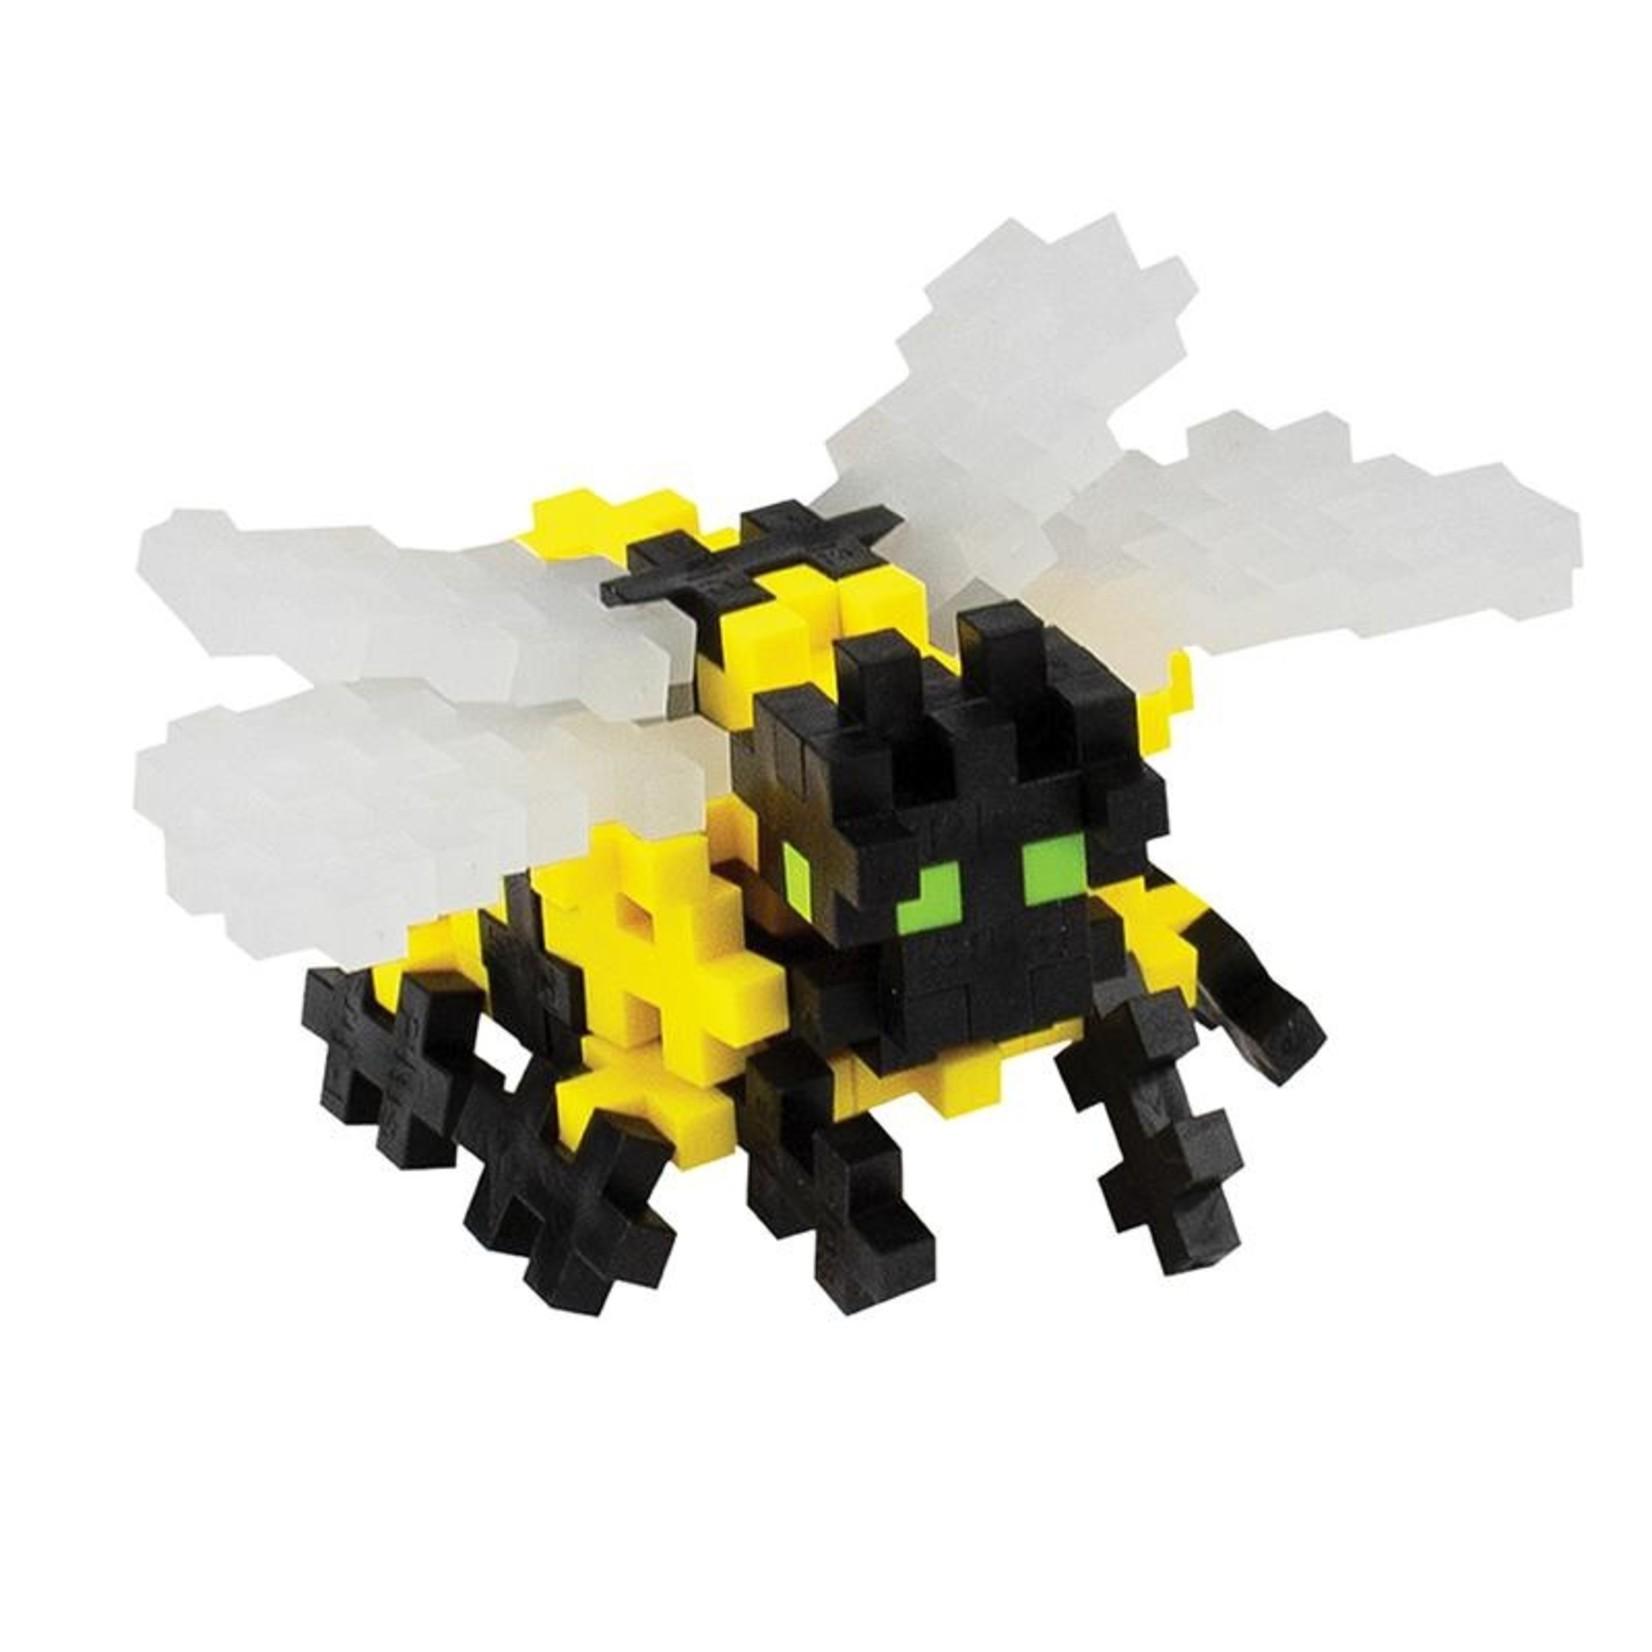 Plus-Plus Plus-Plus Bumble Bee Tube